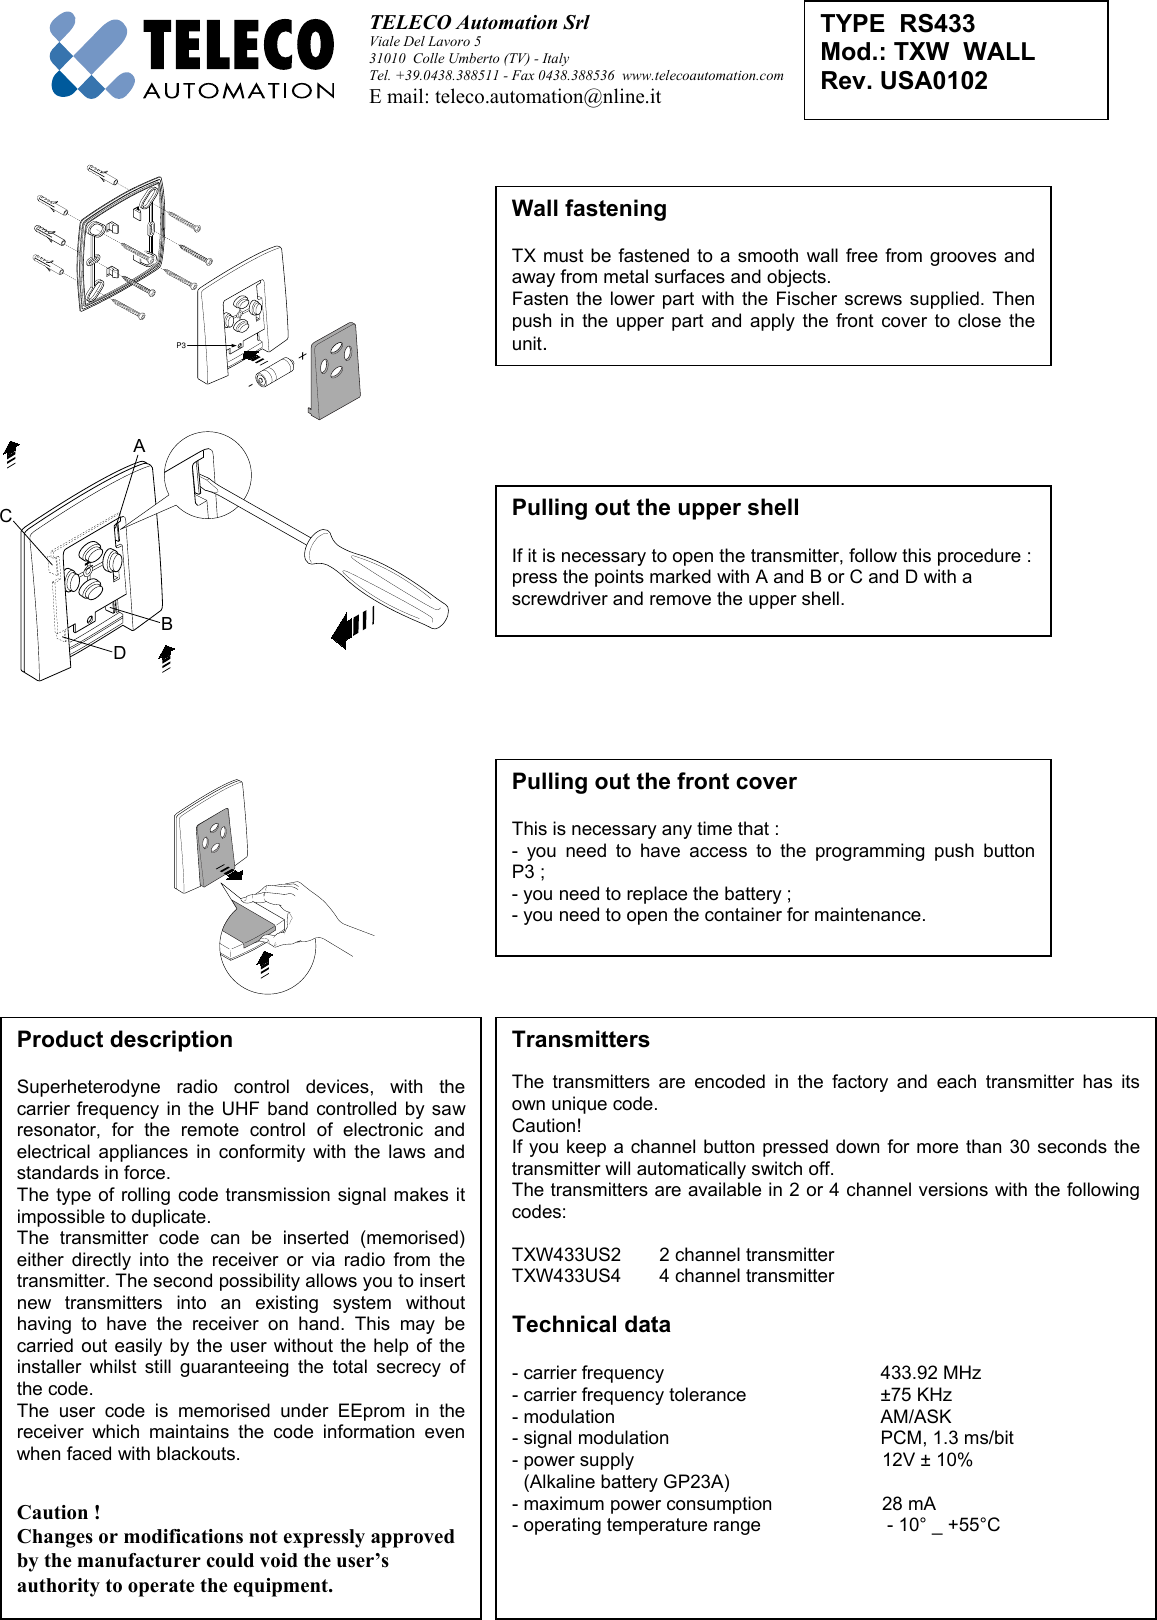 teleco automation s r l txrw433us remote control gates doors rh usermanual wiki etc element user manual etc revolution user manual